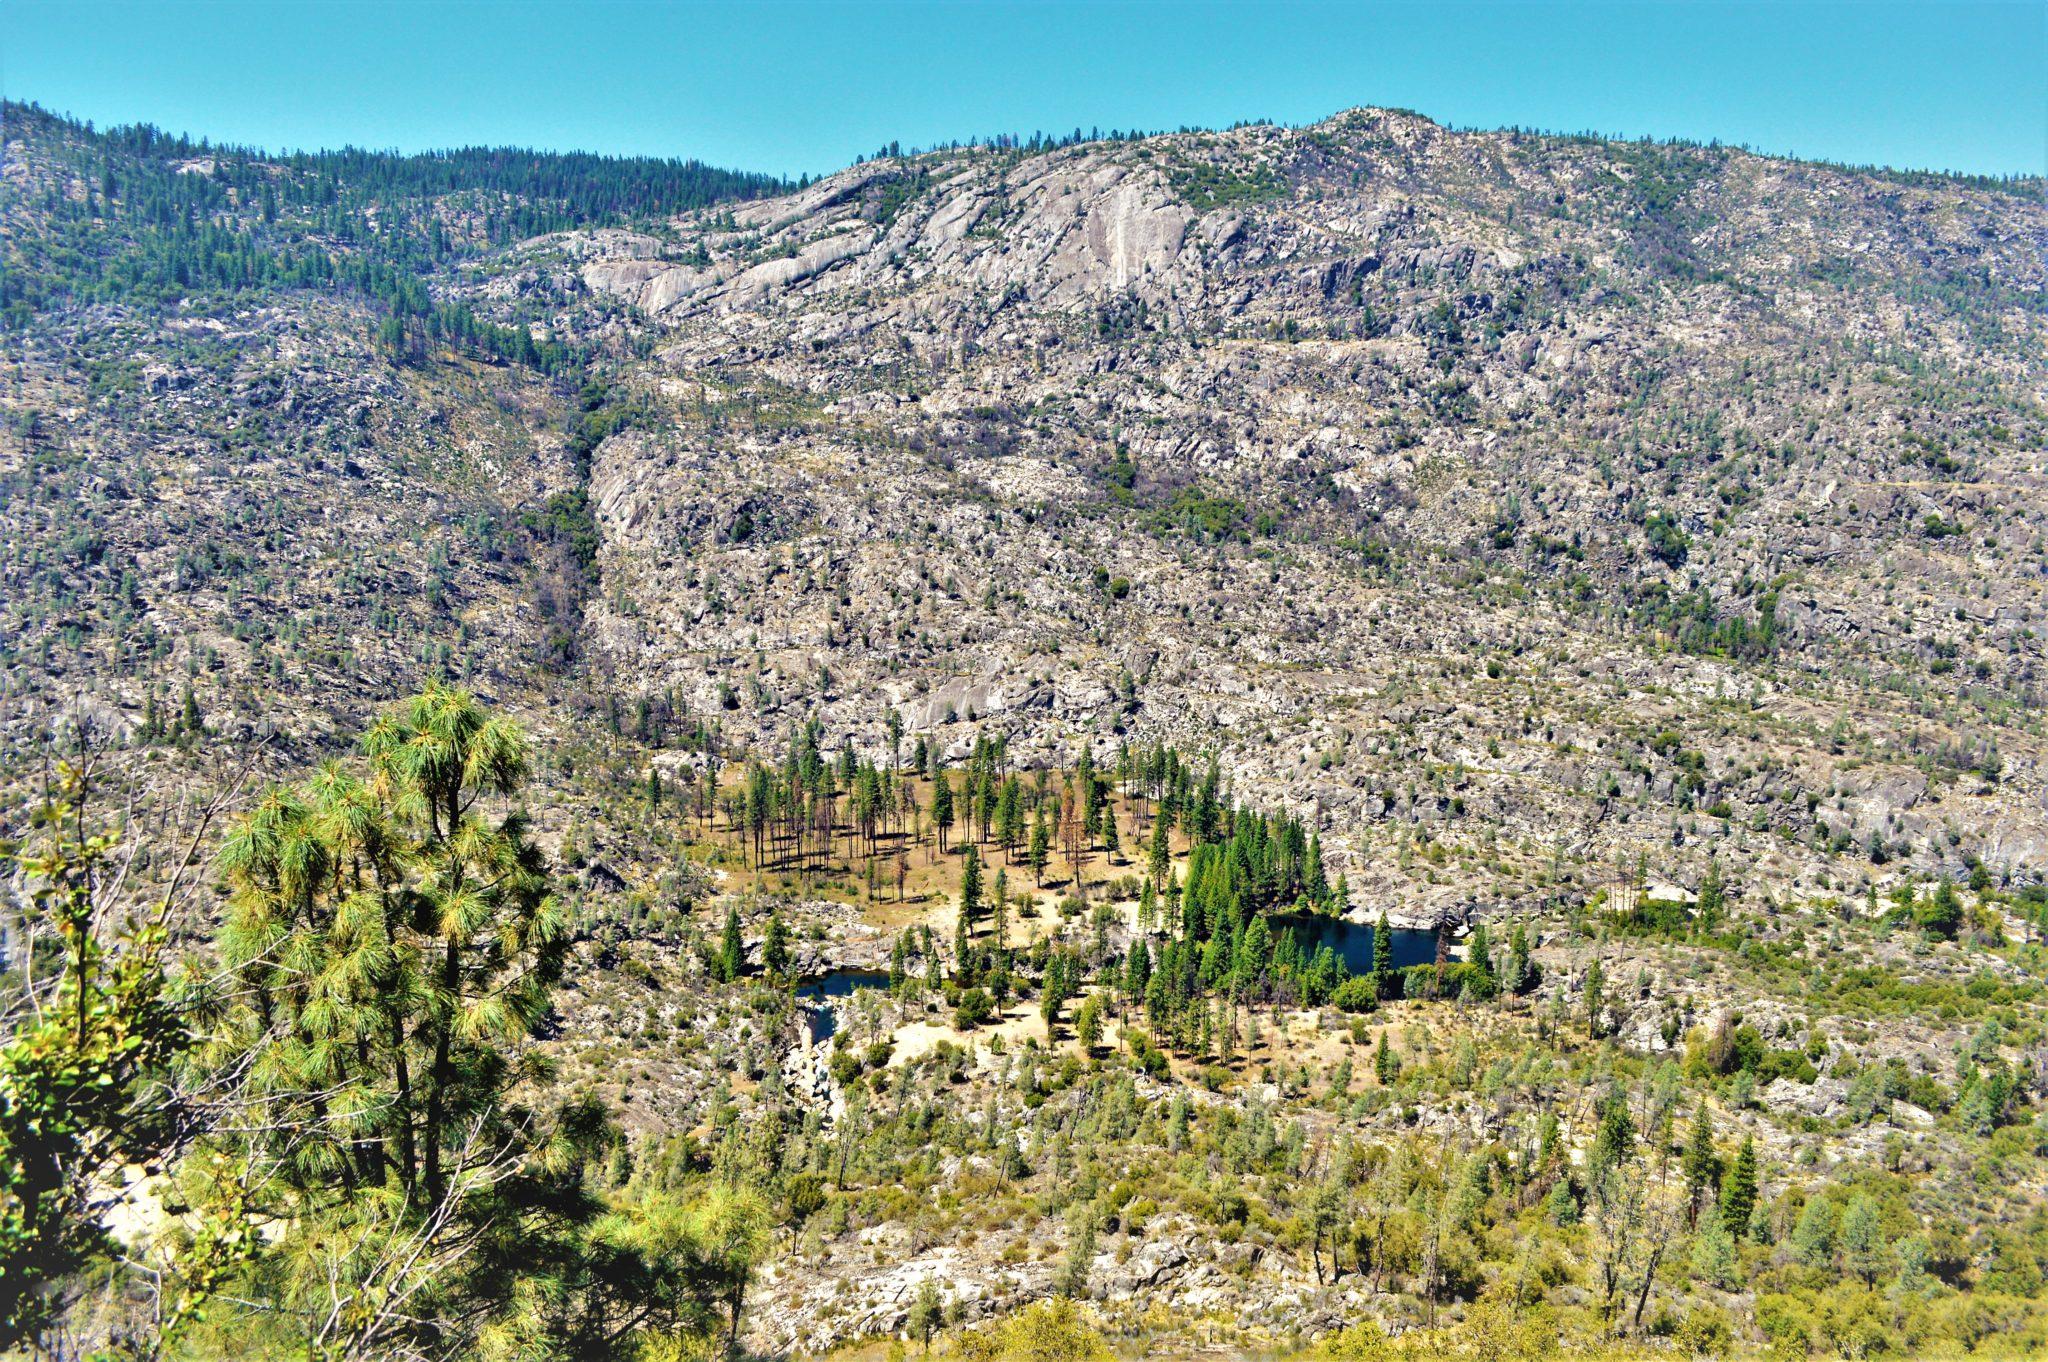 Hetch Hetchy mountains, California, Yosemite